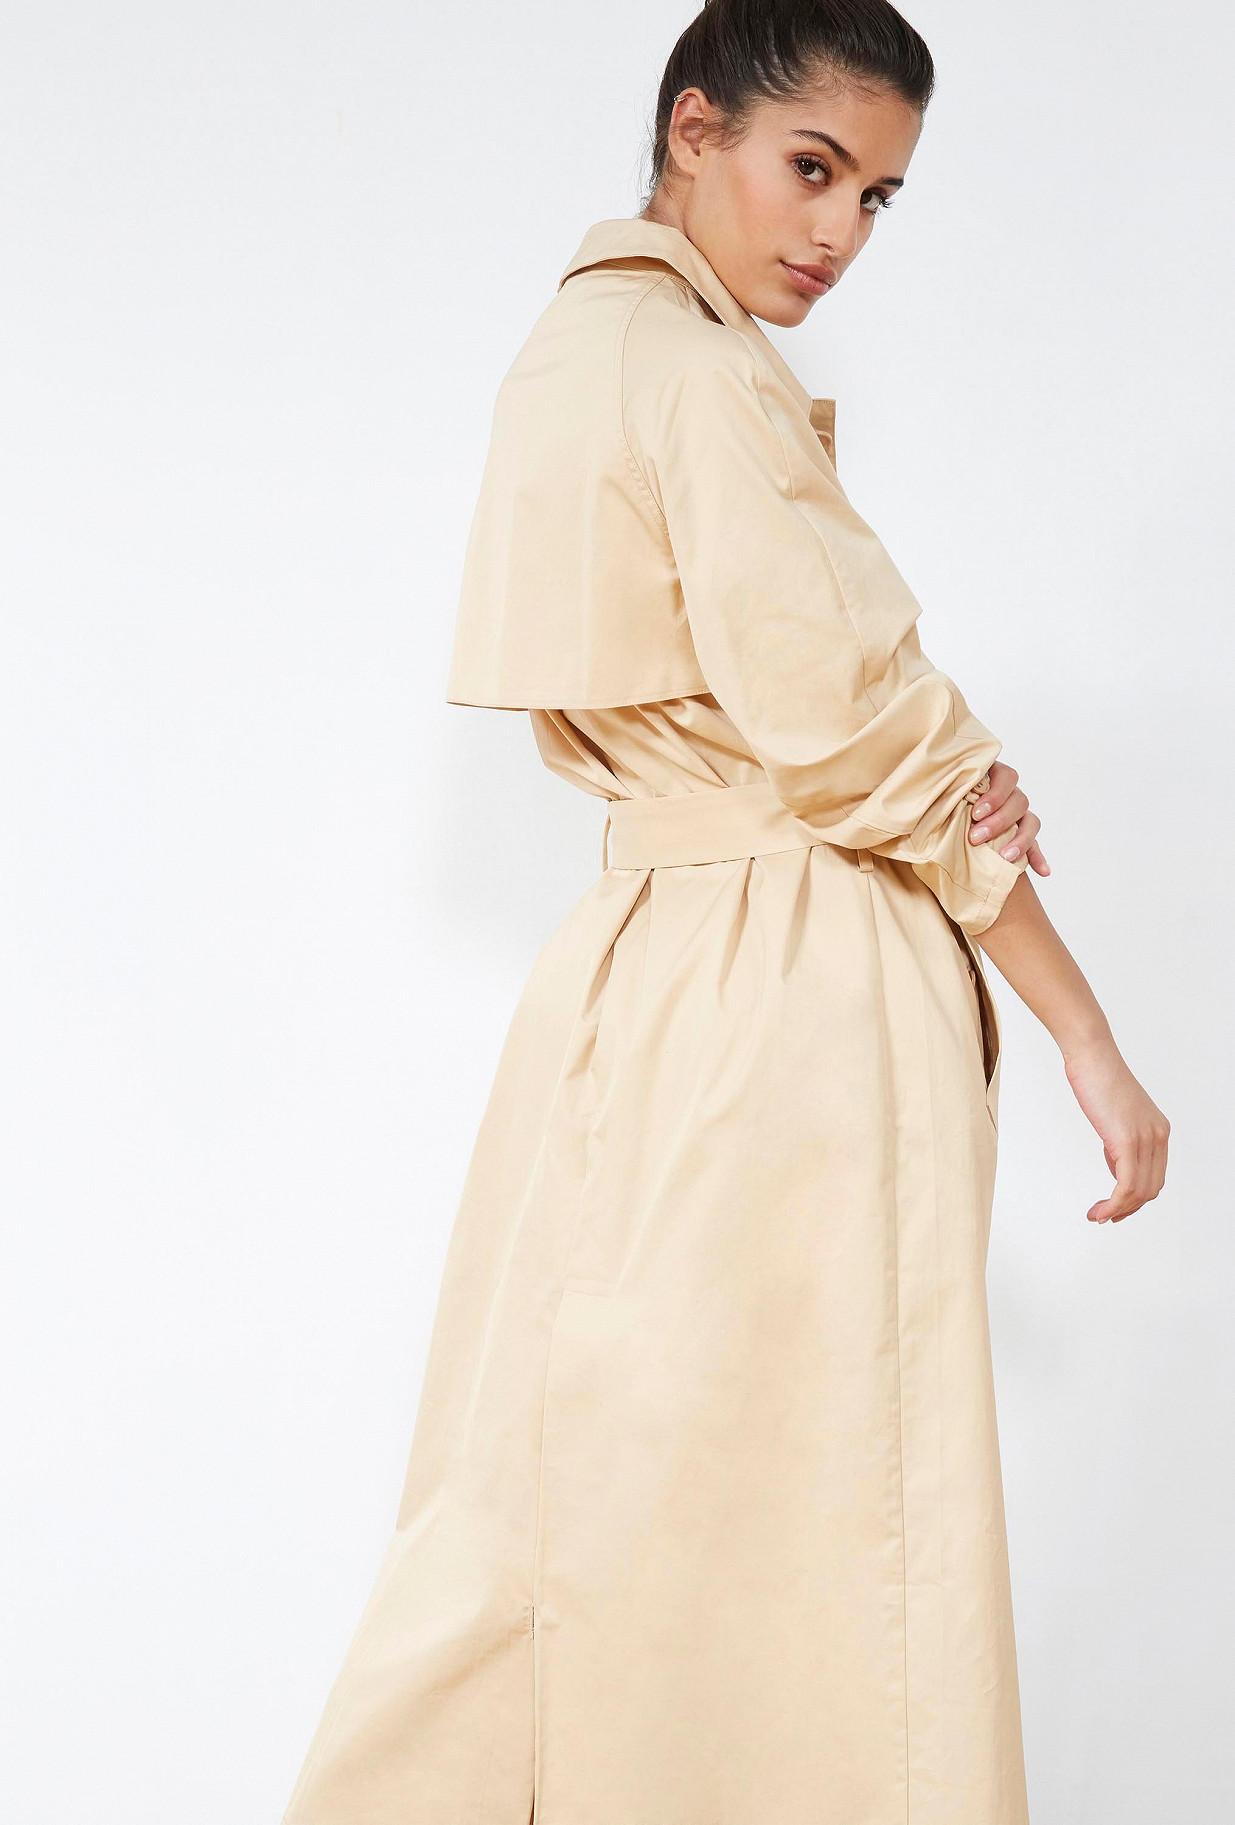 clothes store COAT  Rothko french designer fashion Paris